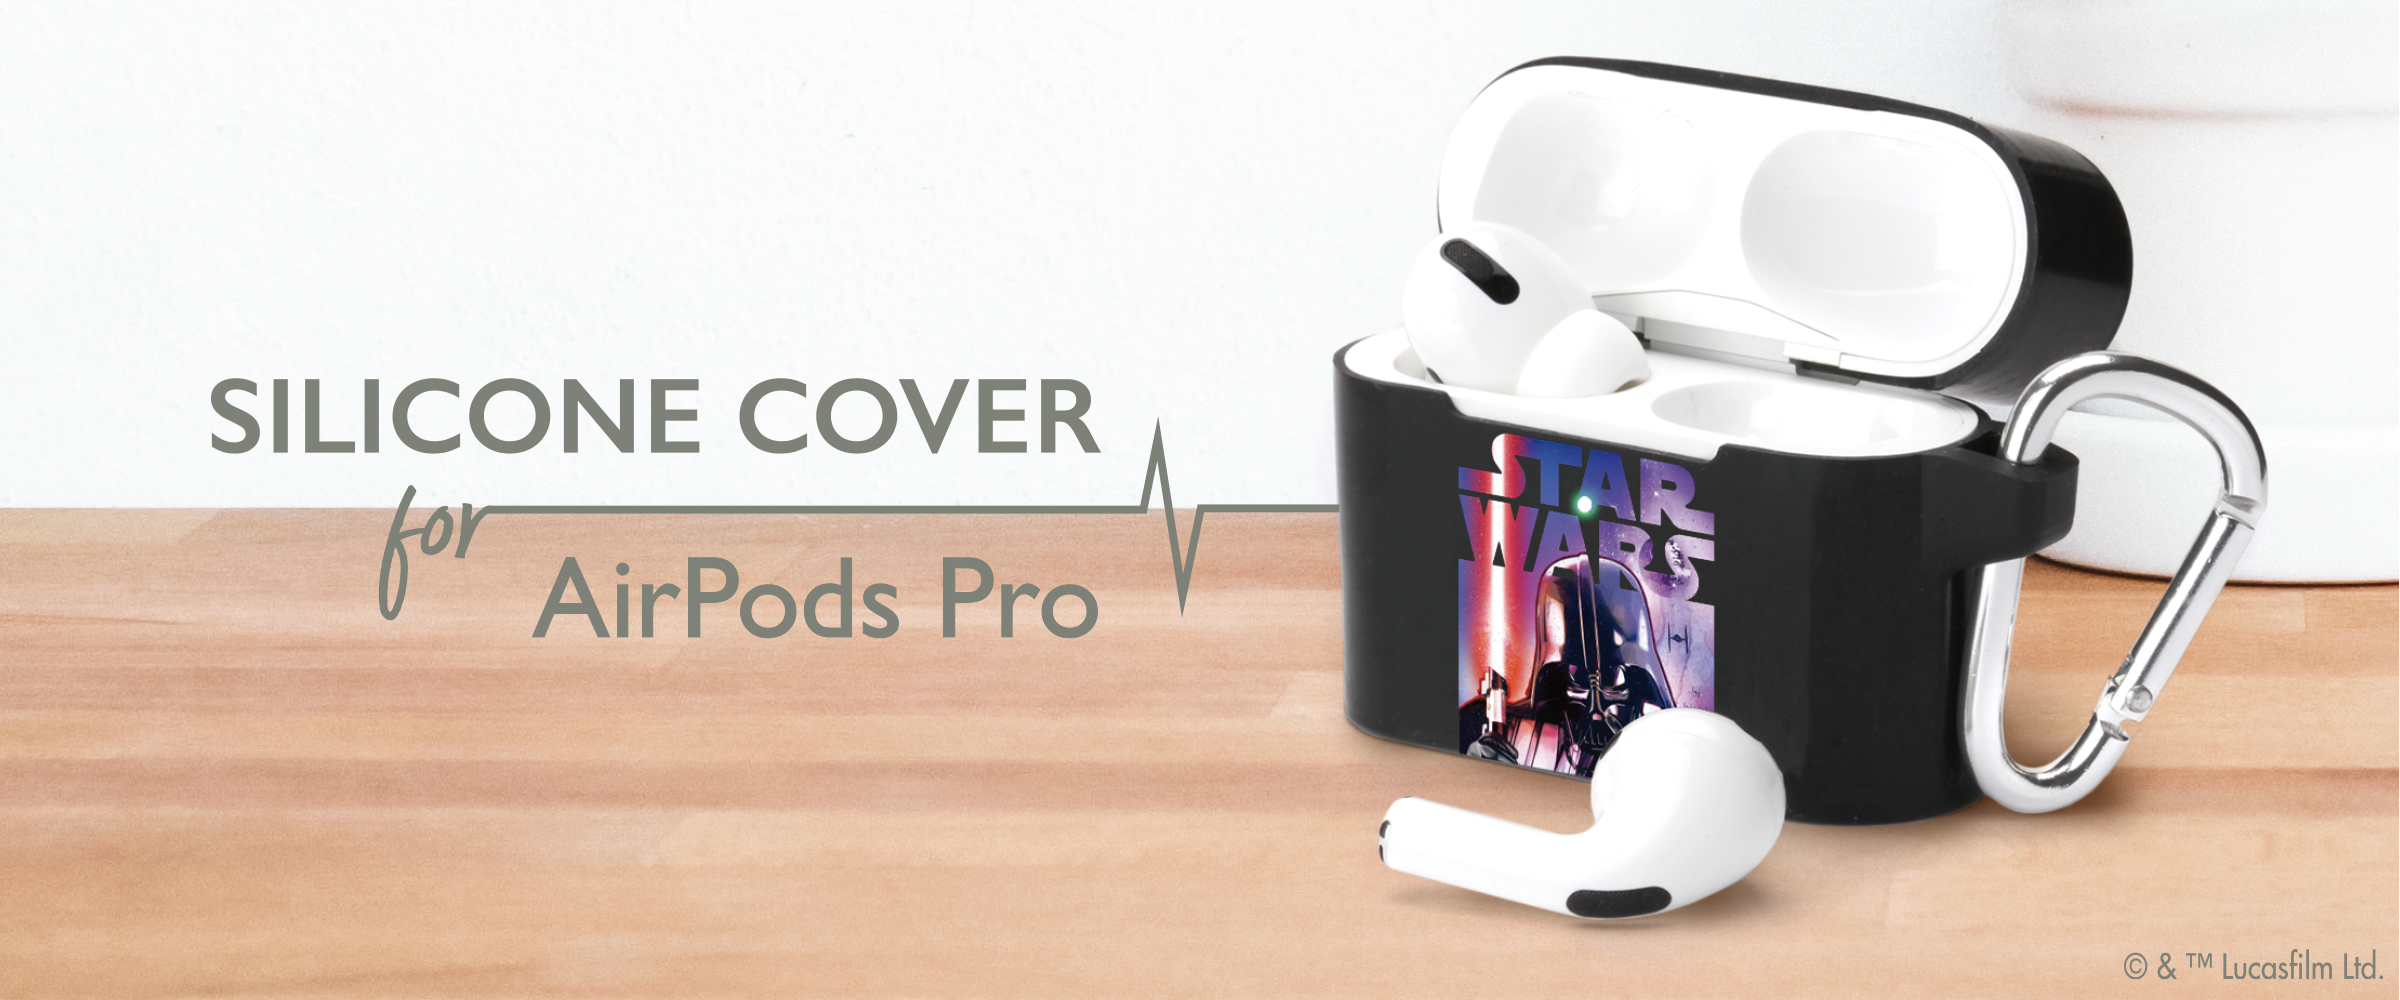 【STAR WARS】AirPods Pro 充電ケース用シリコンカバー